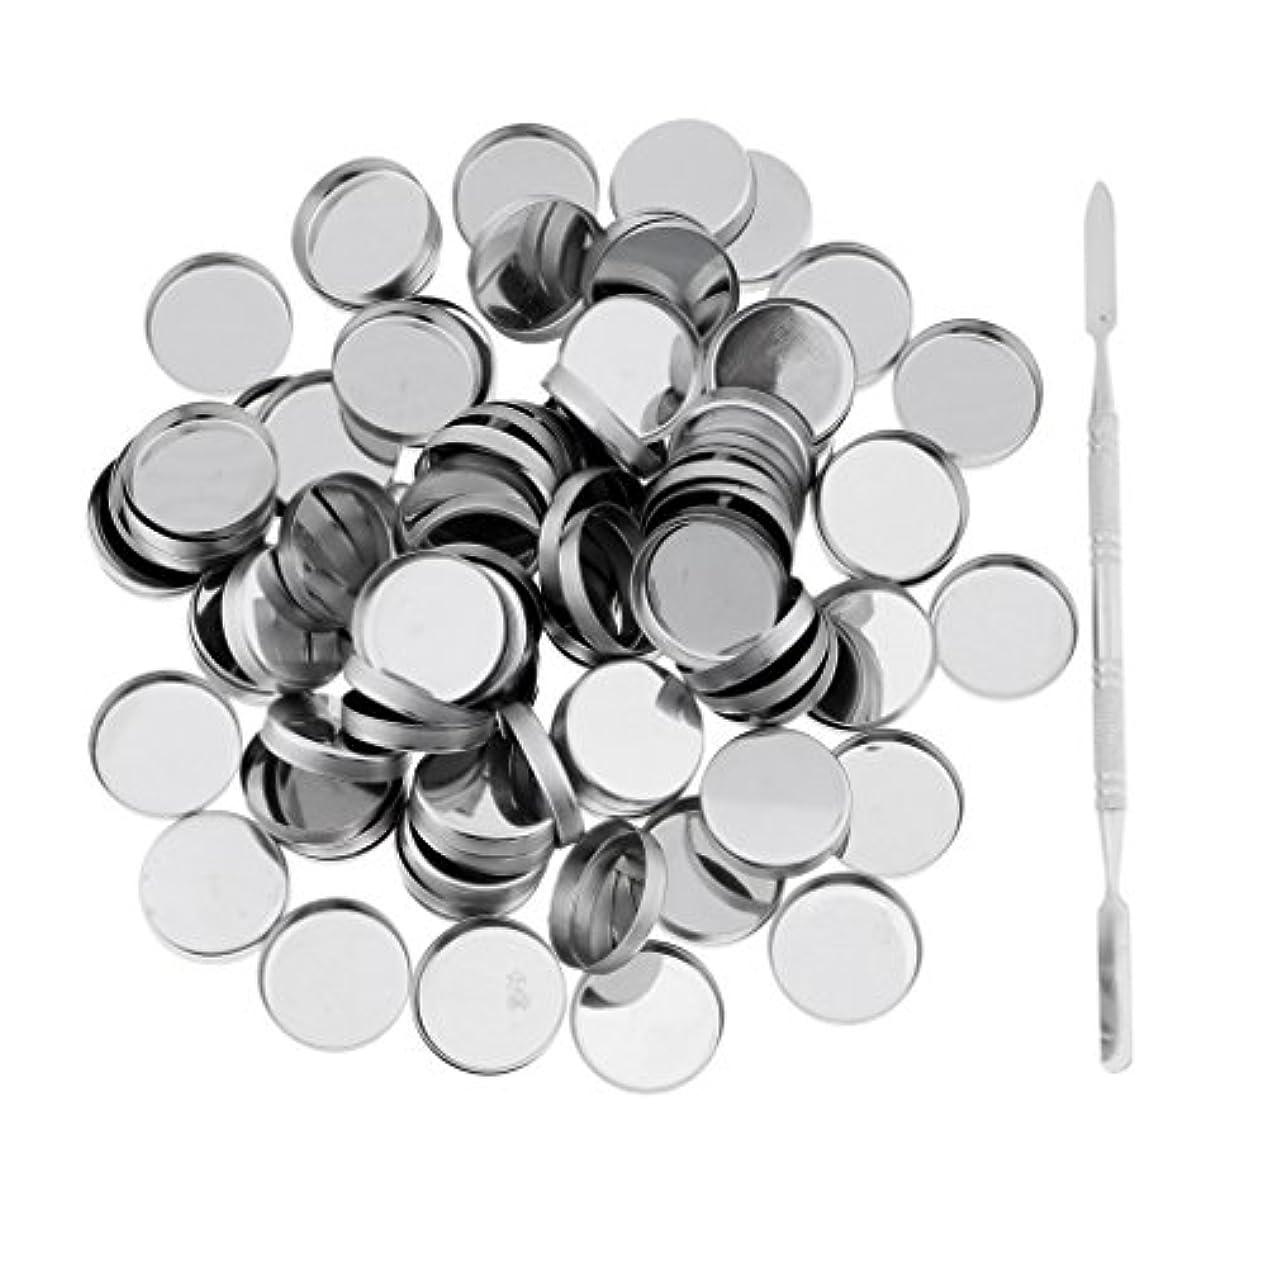 Perfk 約100個 メイクアップパン 空パン スティック 金属棒  DIYプレス アイシャドウ/ブラッシュ/パウダー/クリーム コスメ DIY 2タイプ選べる  - ラウンドパン